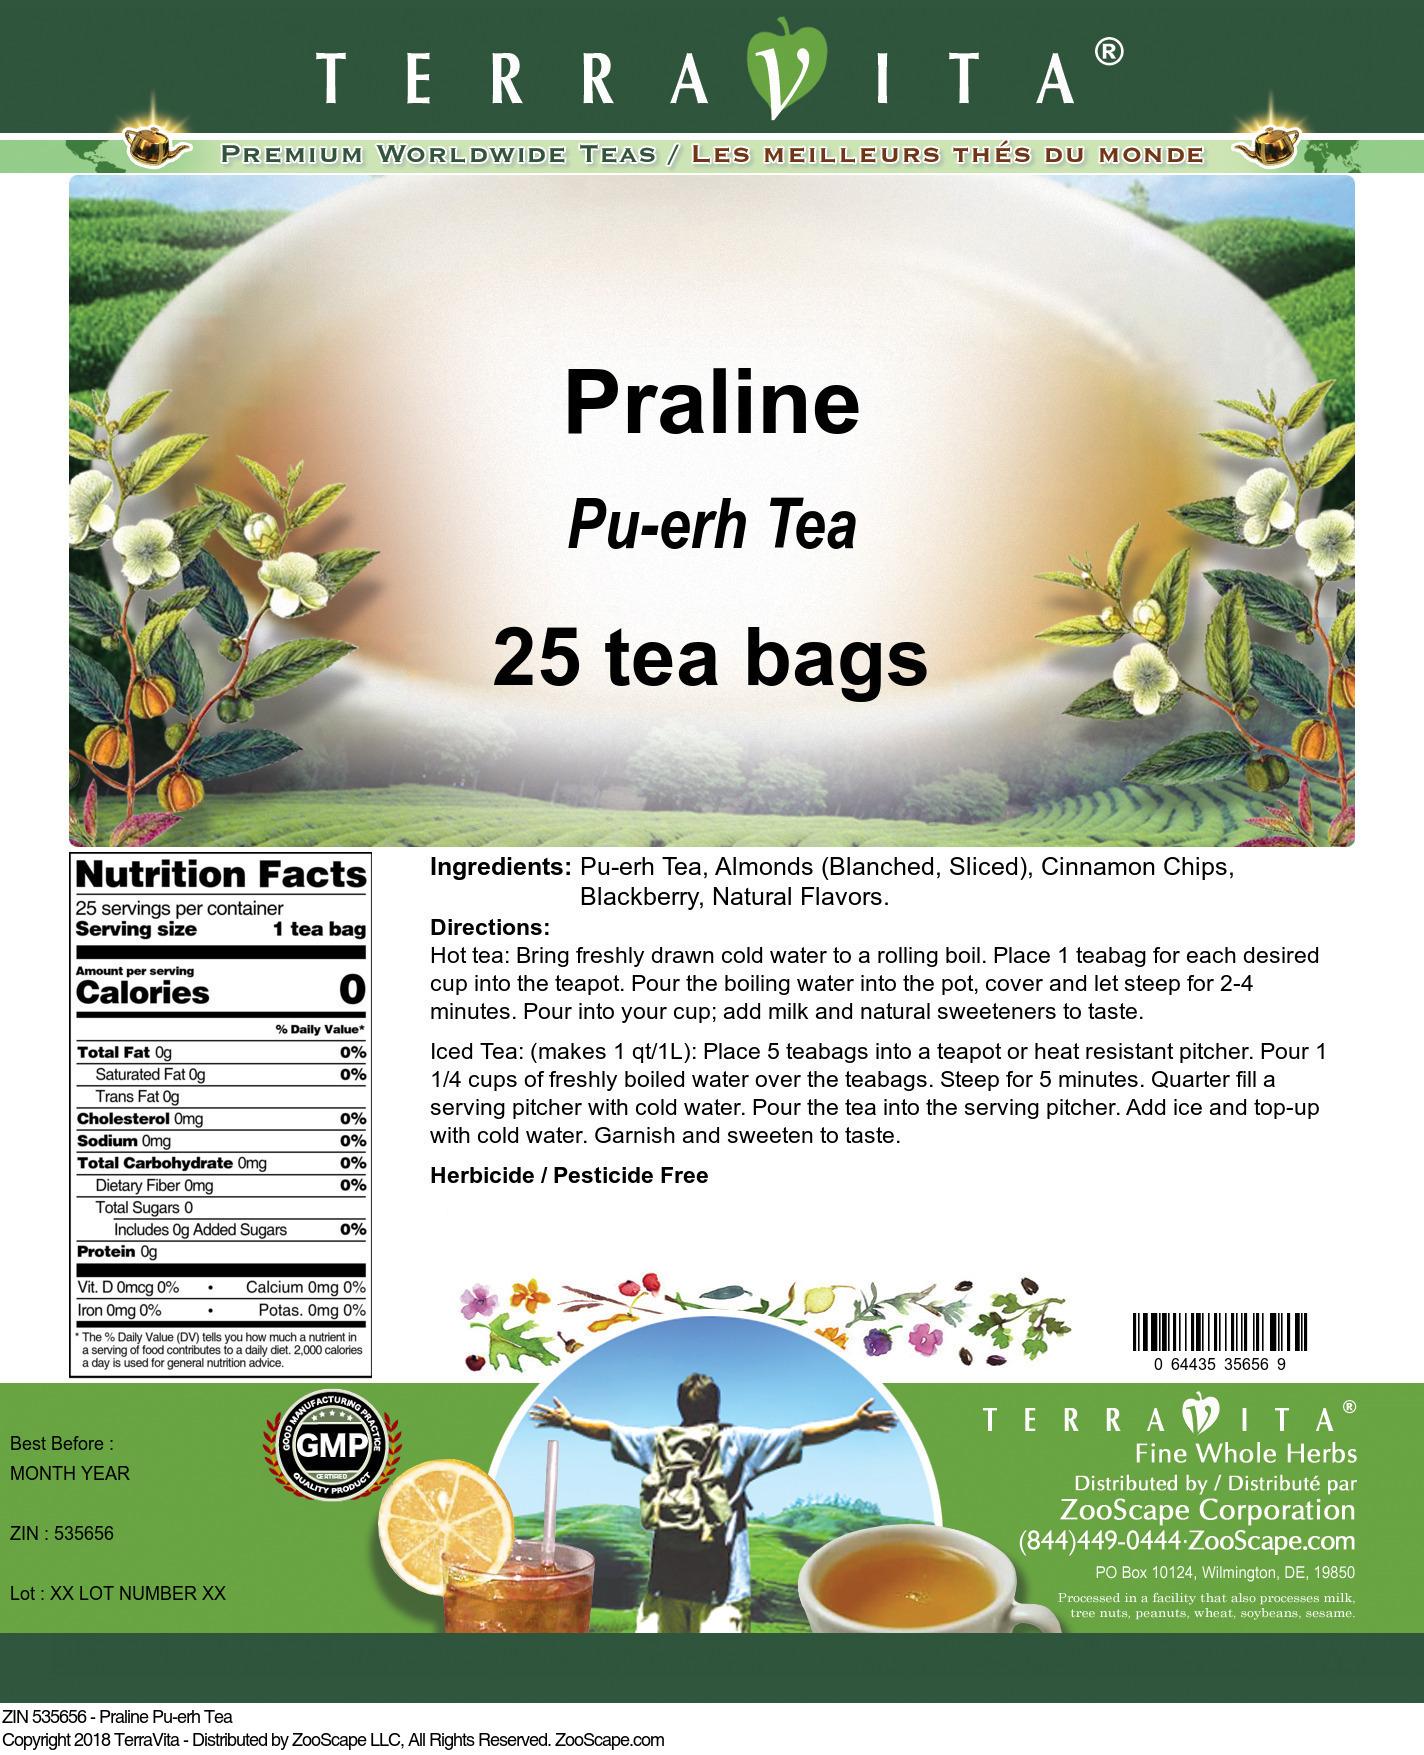 Praline Pu-erh Tea